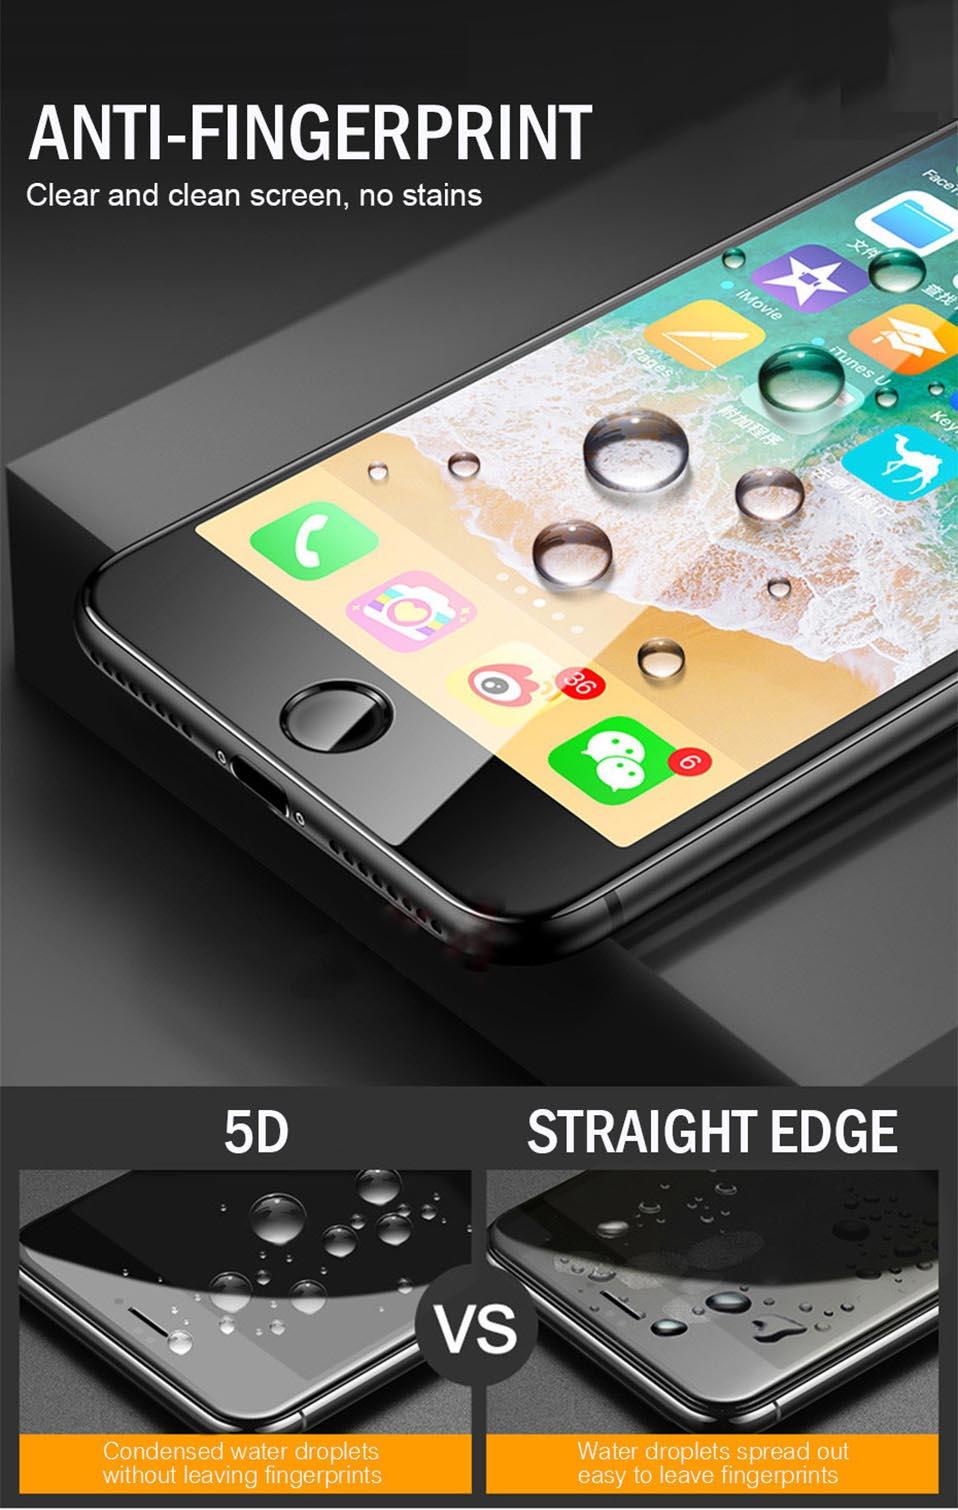 5D Glasses for iPhone 6 6s plus Glass Film Full Cover iphone6 Screen Protector for iPhone 6 6s 7 8 plus x Tempered Glass 3D 4D (2)